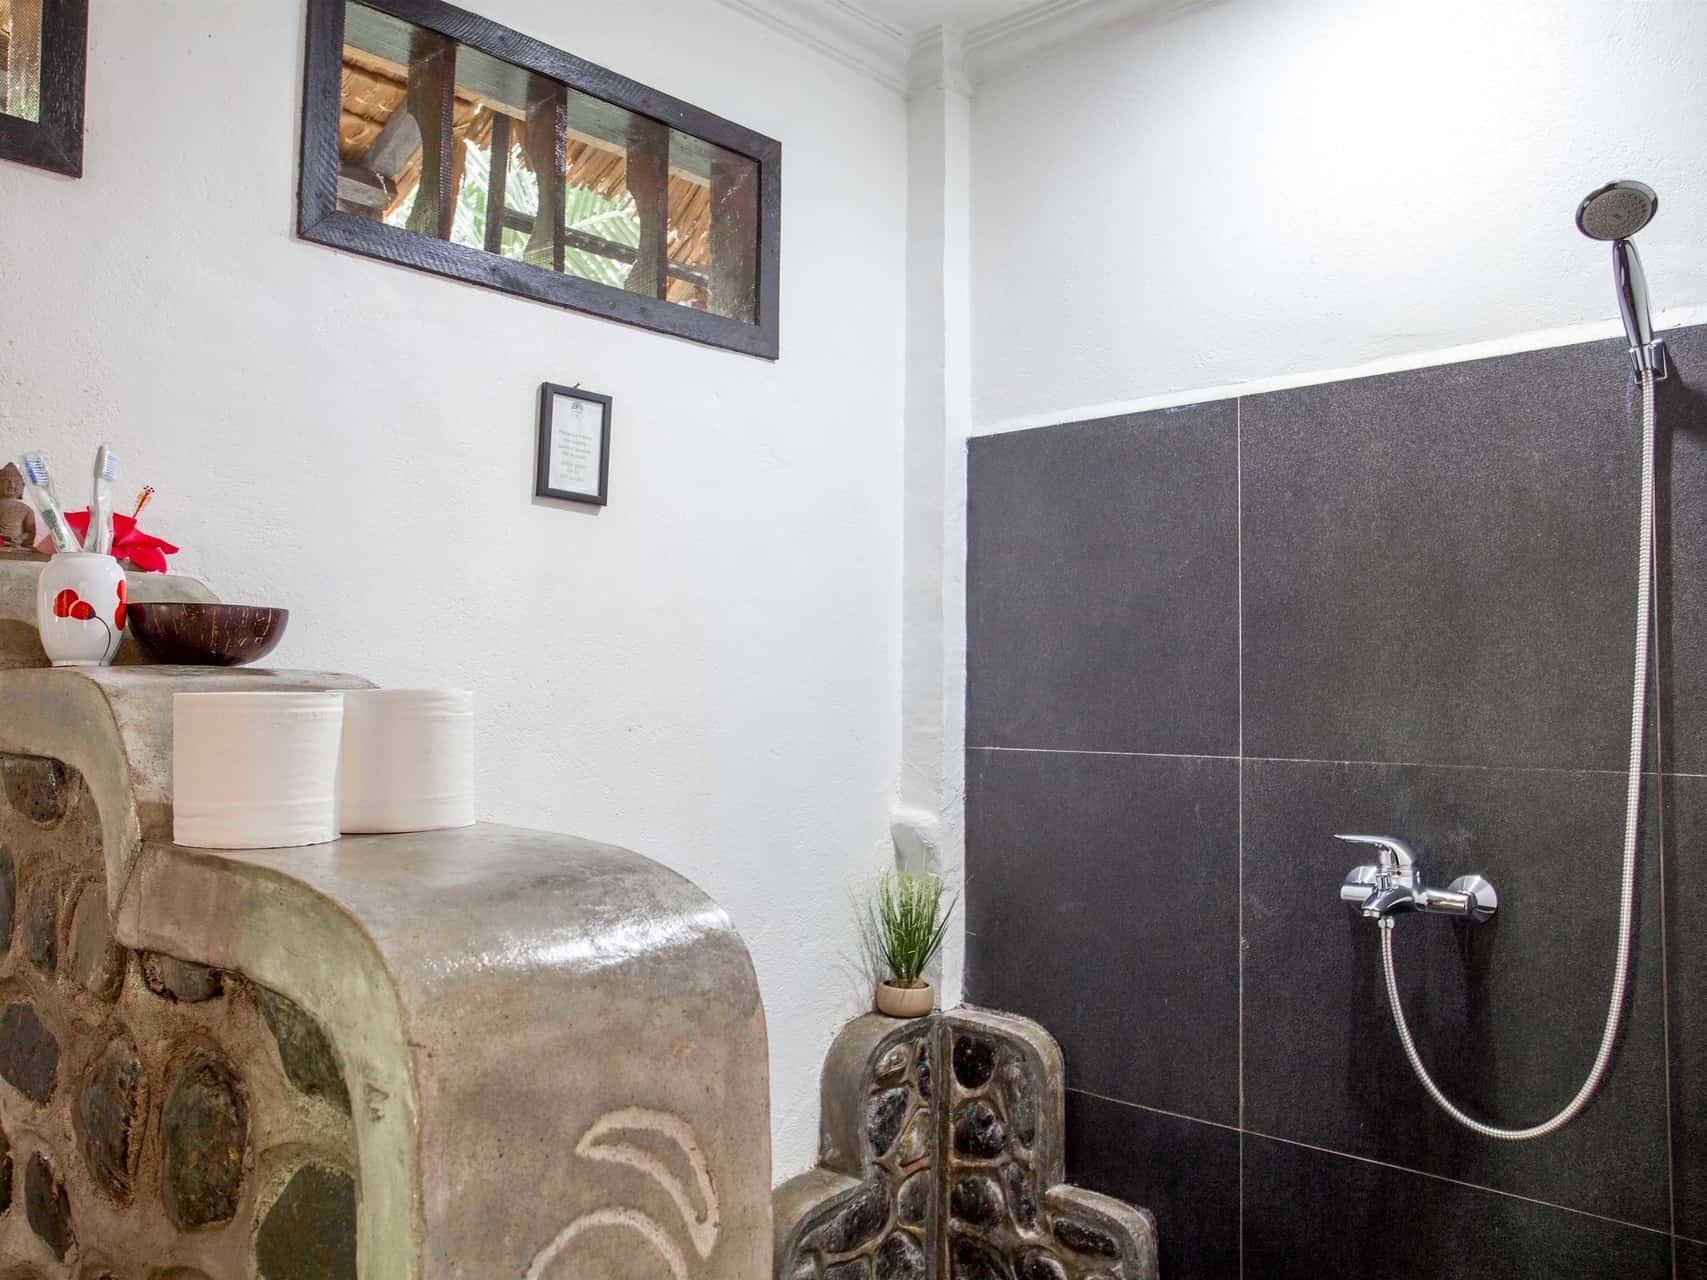 BATHROOM JUNGLE VIEW ROOM AT ECOTRAVEL COTTAGES BUKIT LAWANG - SUMATRA ECOTRAVEL